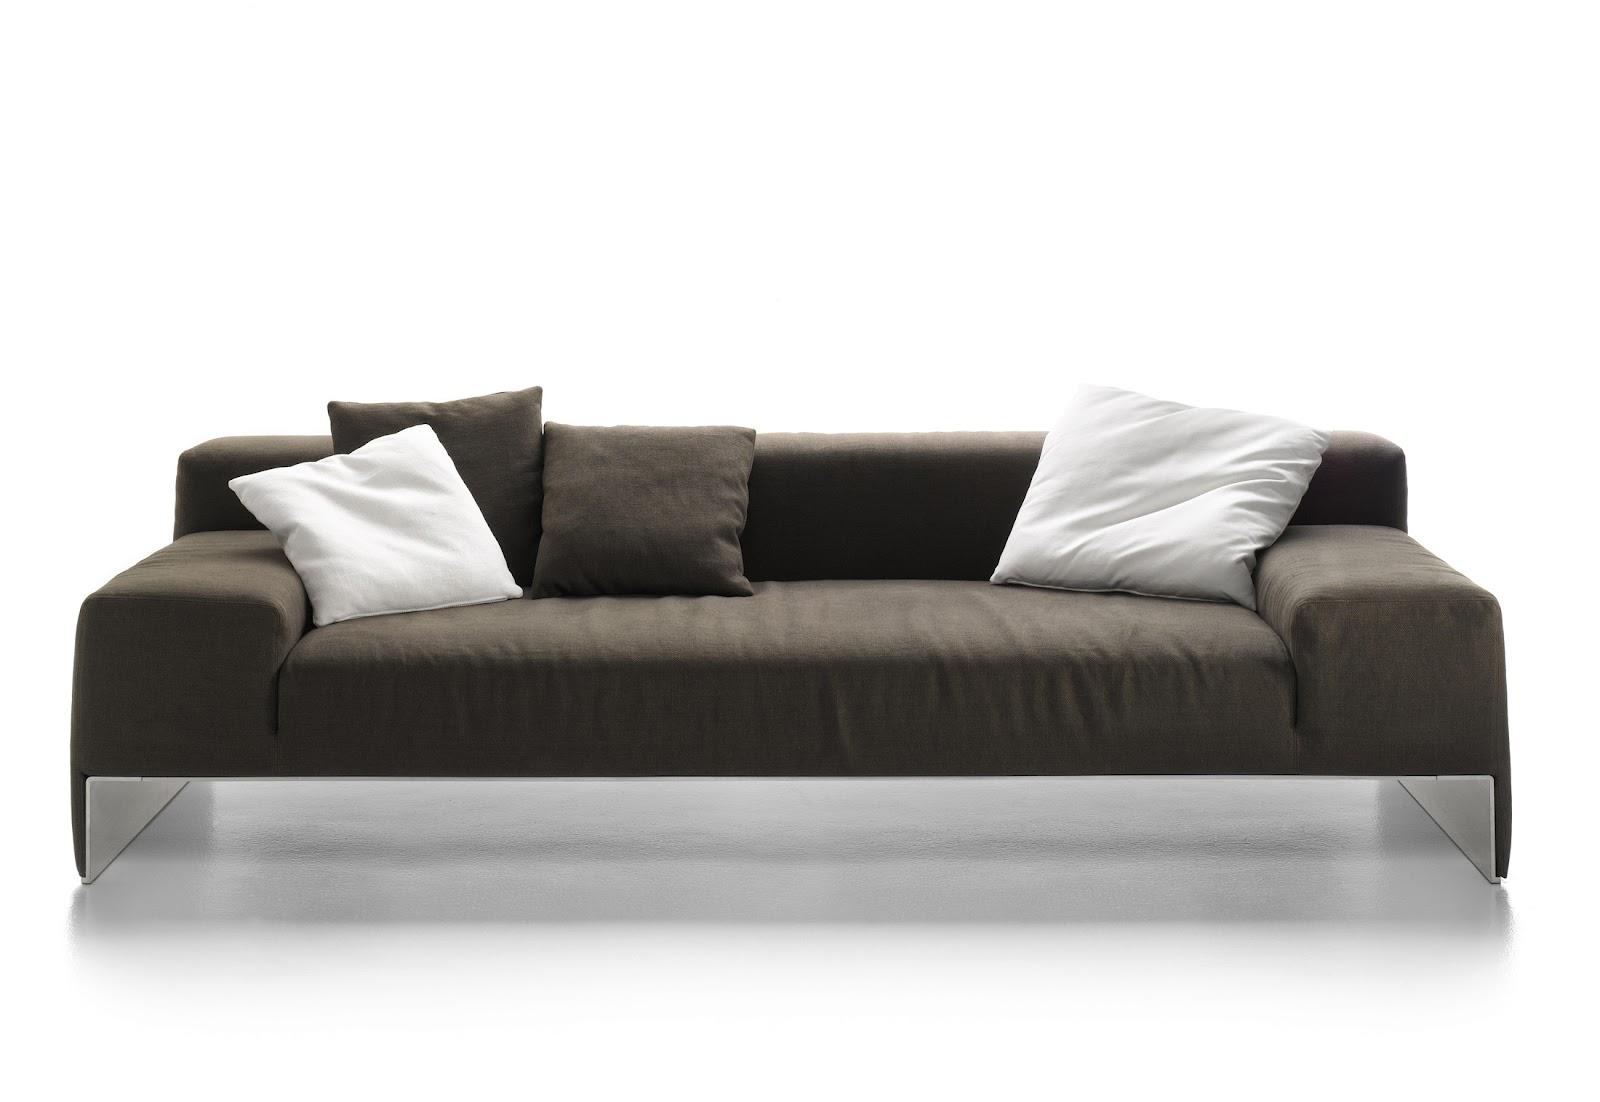 Arch Sofa By Mdf Italia Designer Furniture Fitted